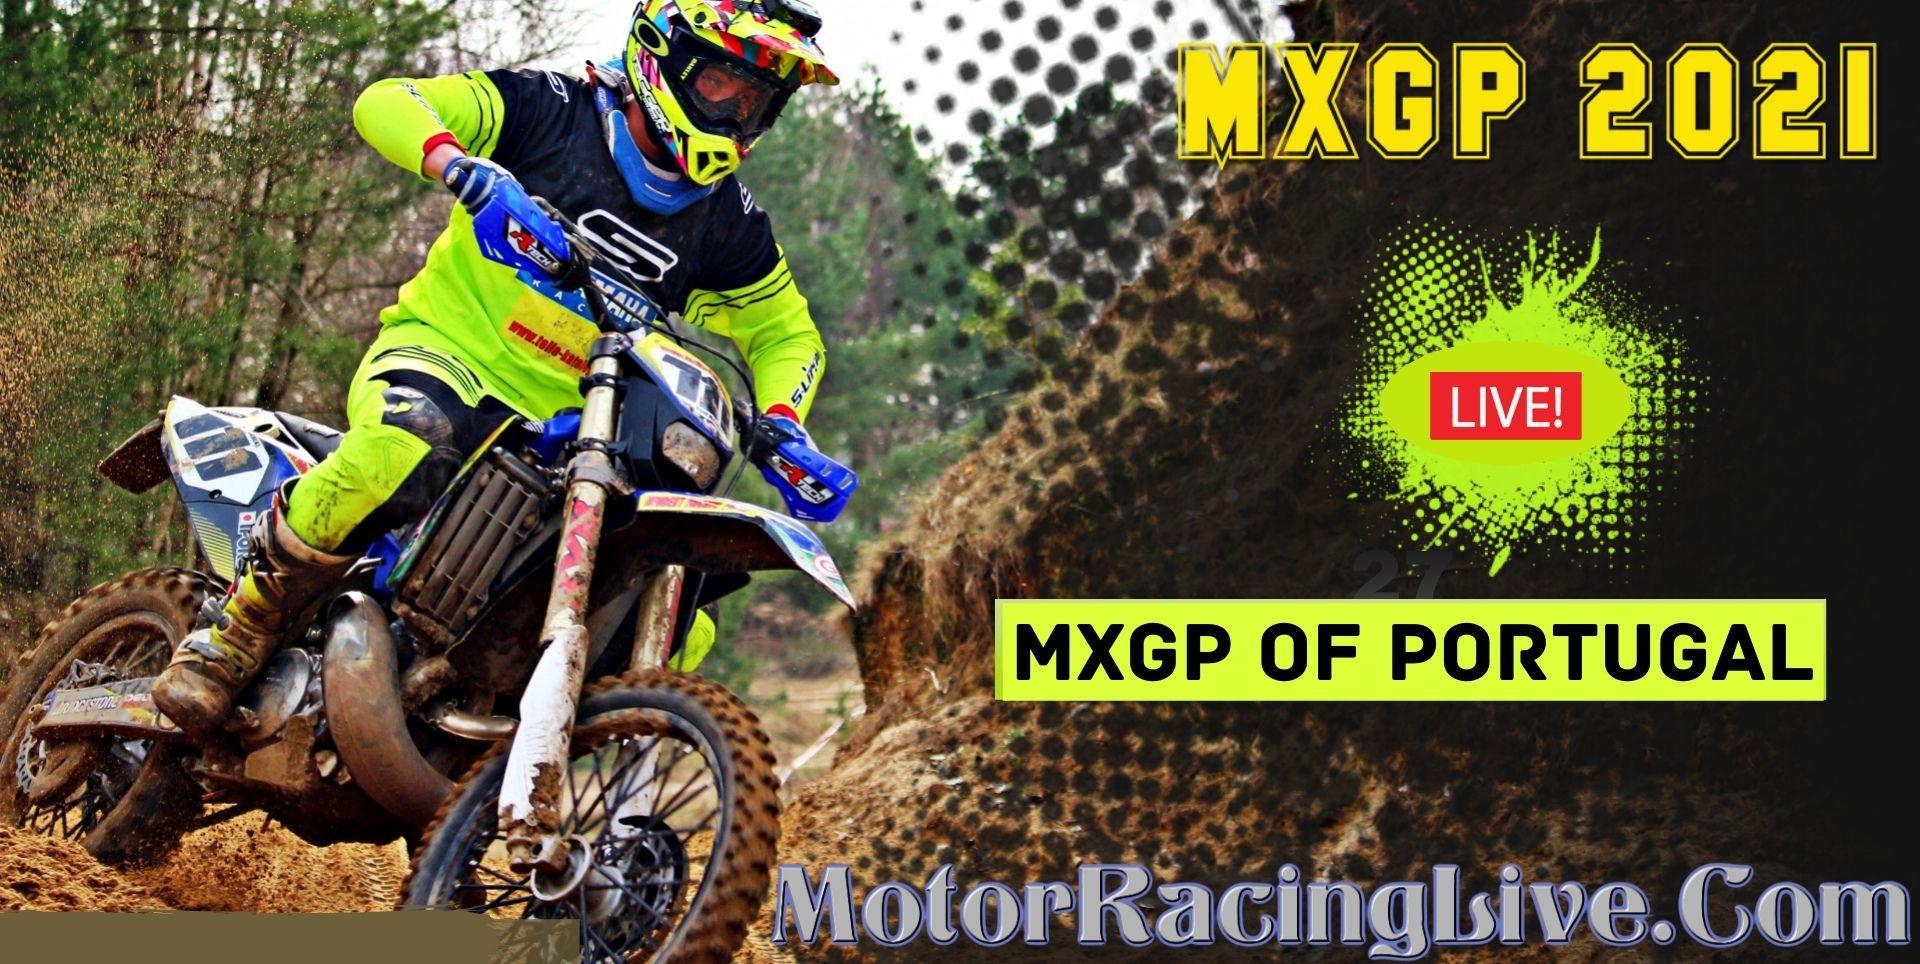 MXGP OF PORTUGAL 2021 Live Stream